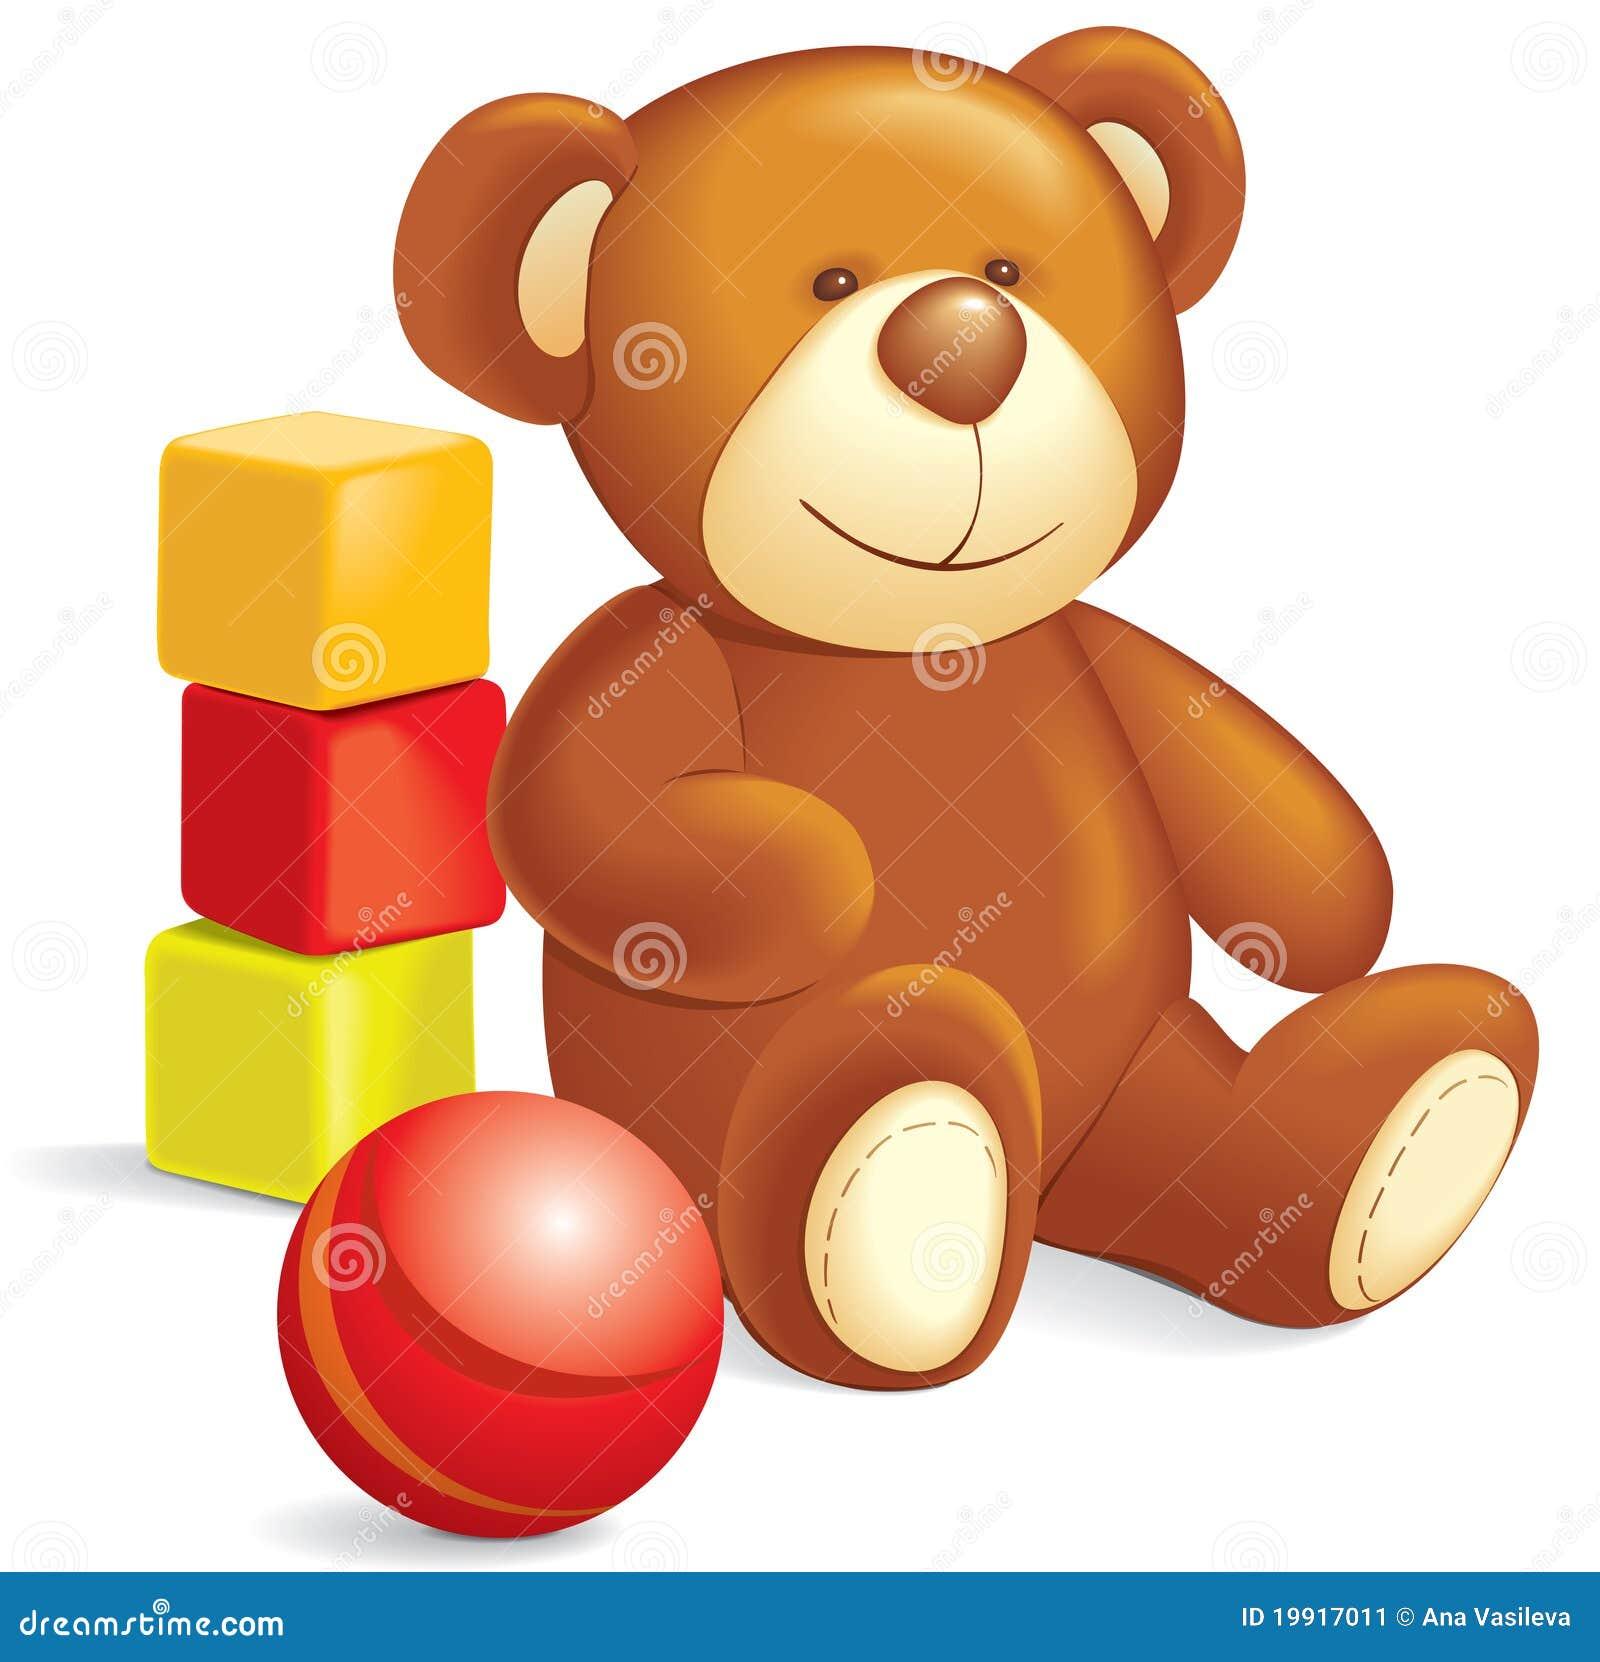 Toy Ball Clip Art : Toys teddy bear cubes ball stock image